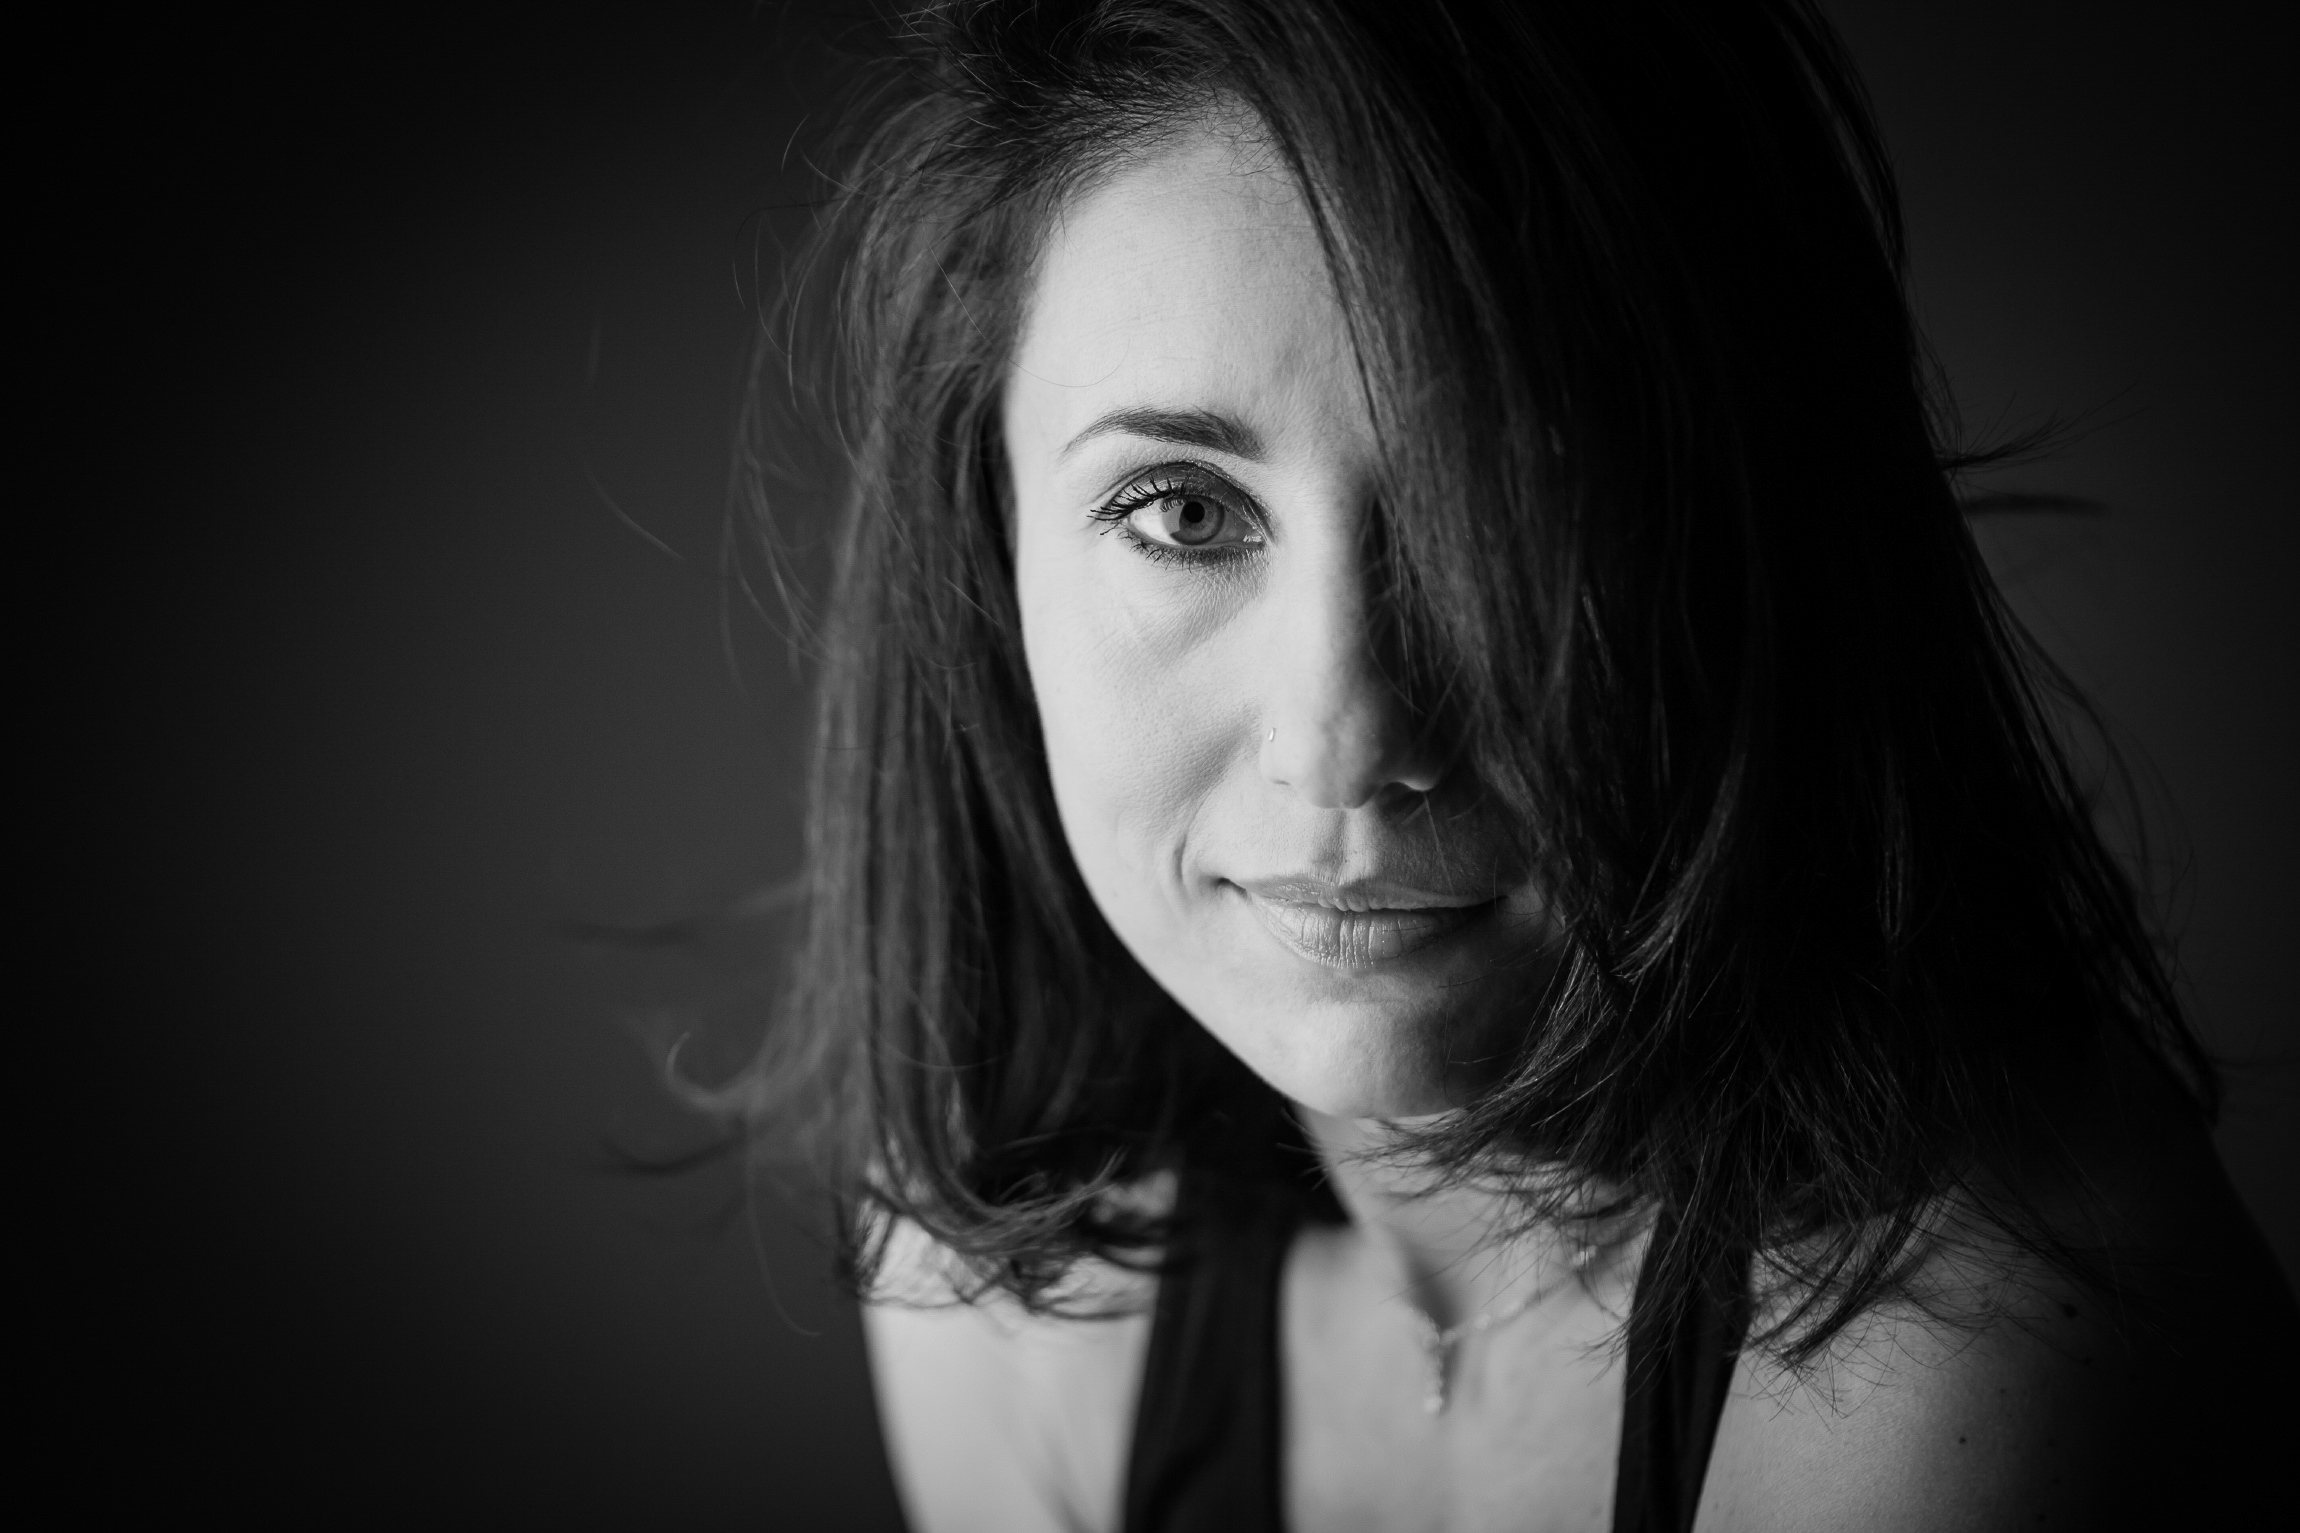 05-foto-professional-celine-pech-andorra-06